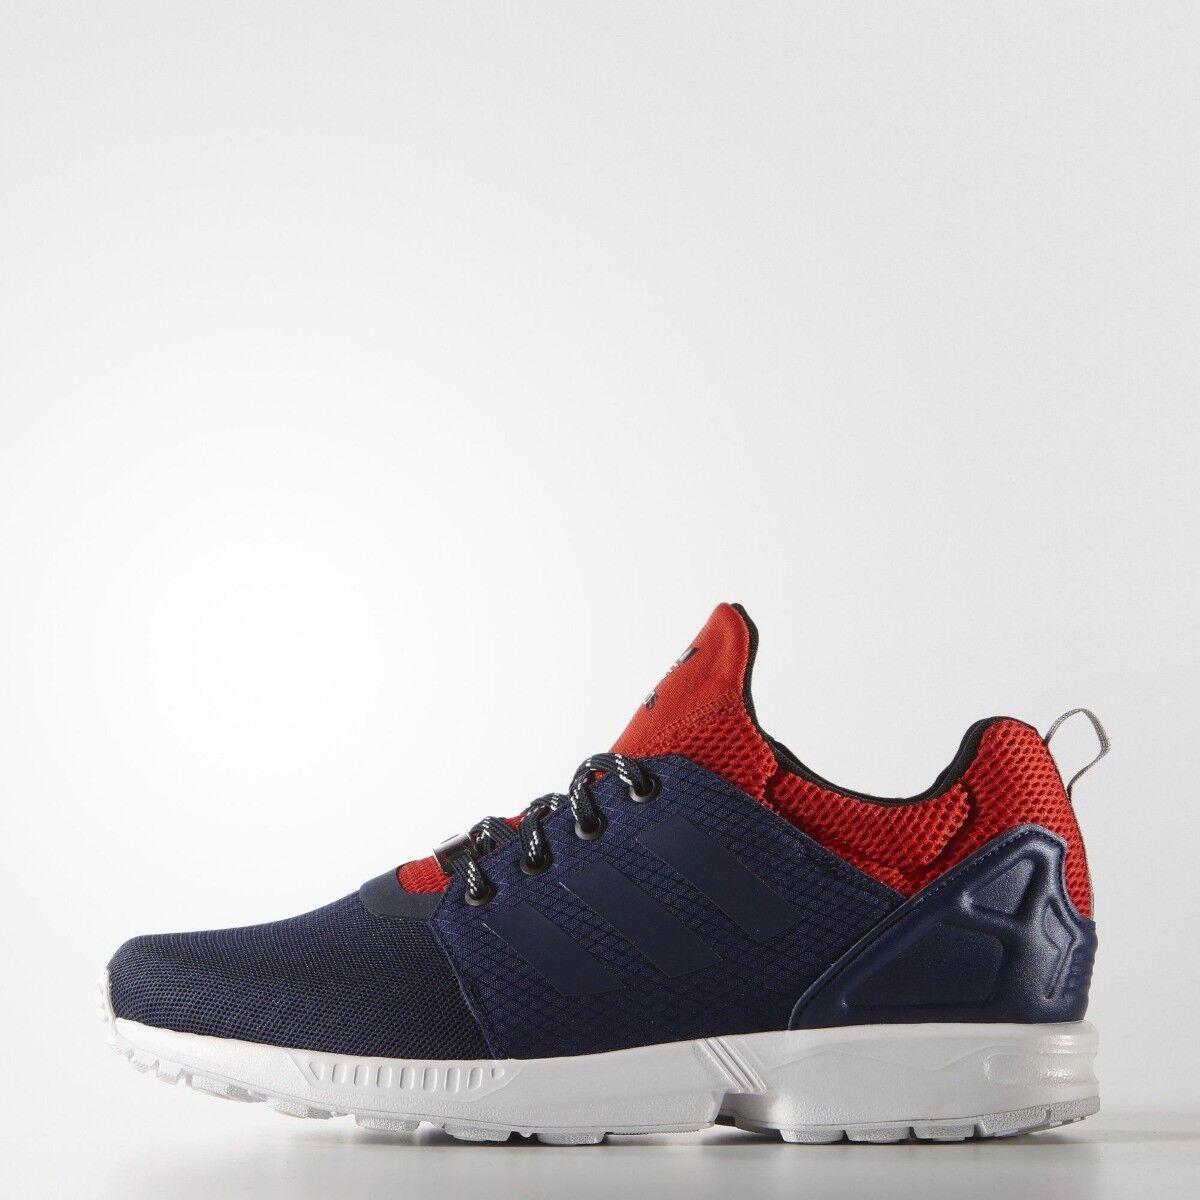 adidas ZX FLUX NPS Zapatos UPDT Hombre Mujer Trainer Zapatos NPS Talla 5 Azul -  75/- 4deeb2